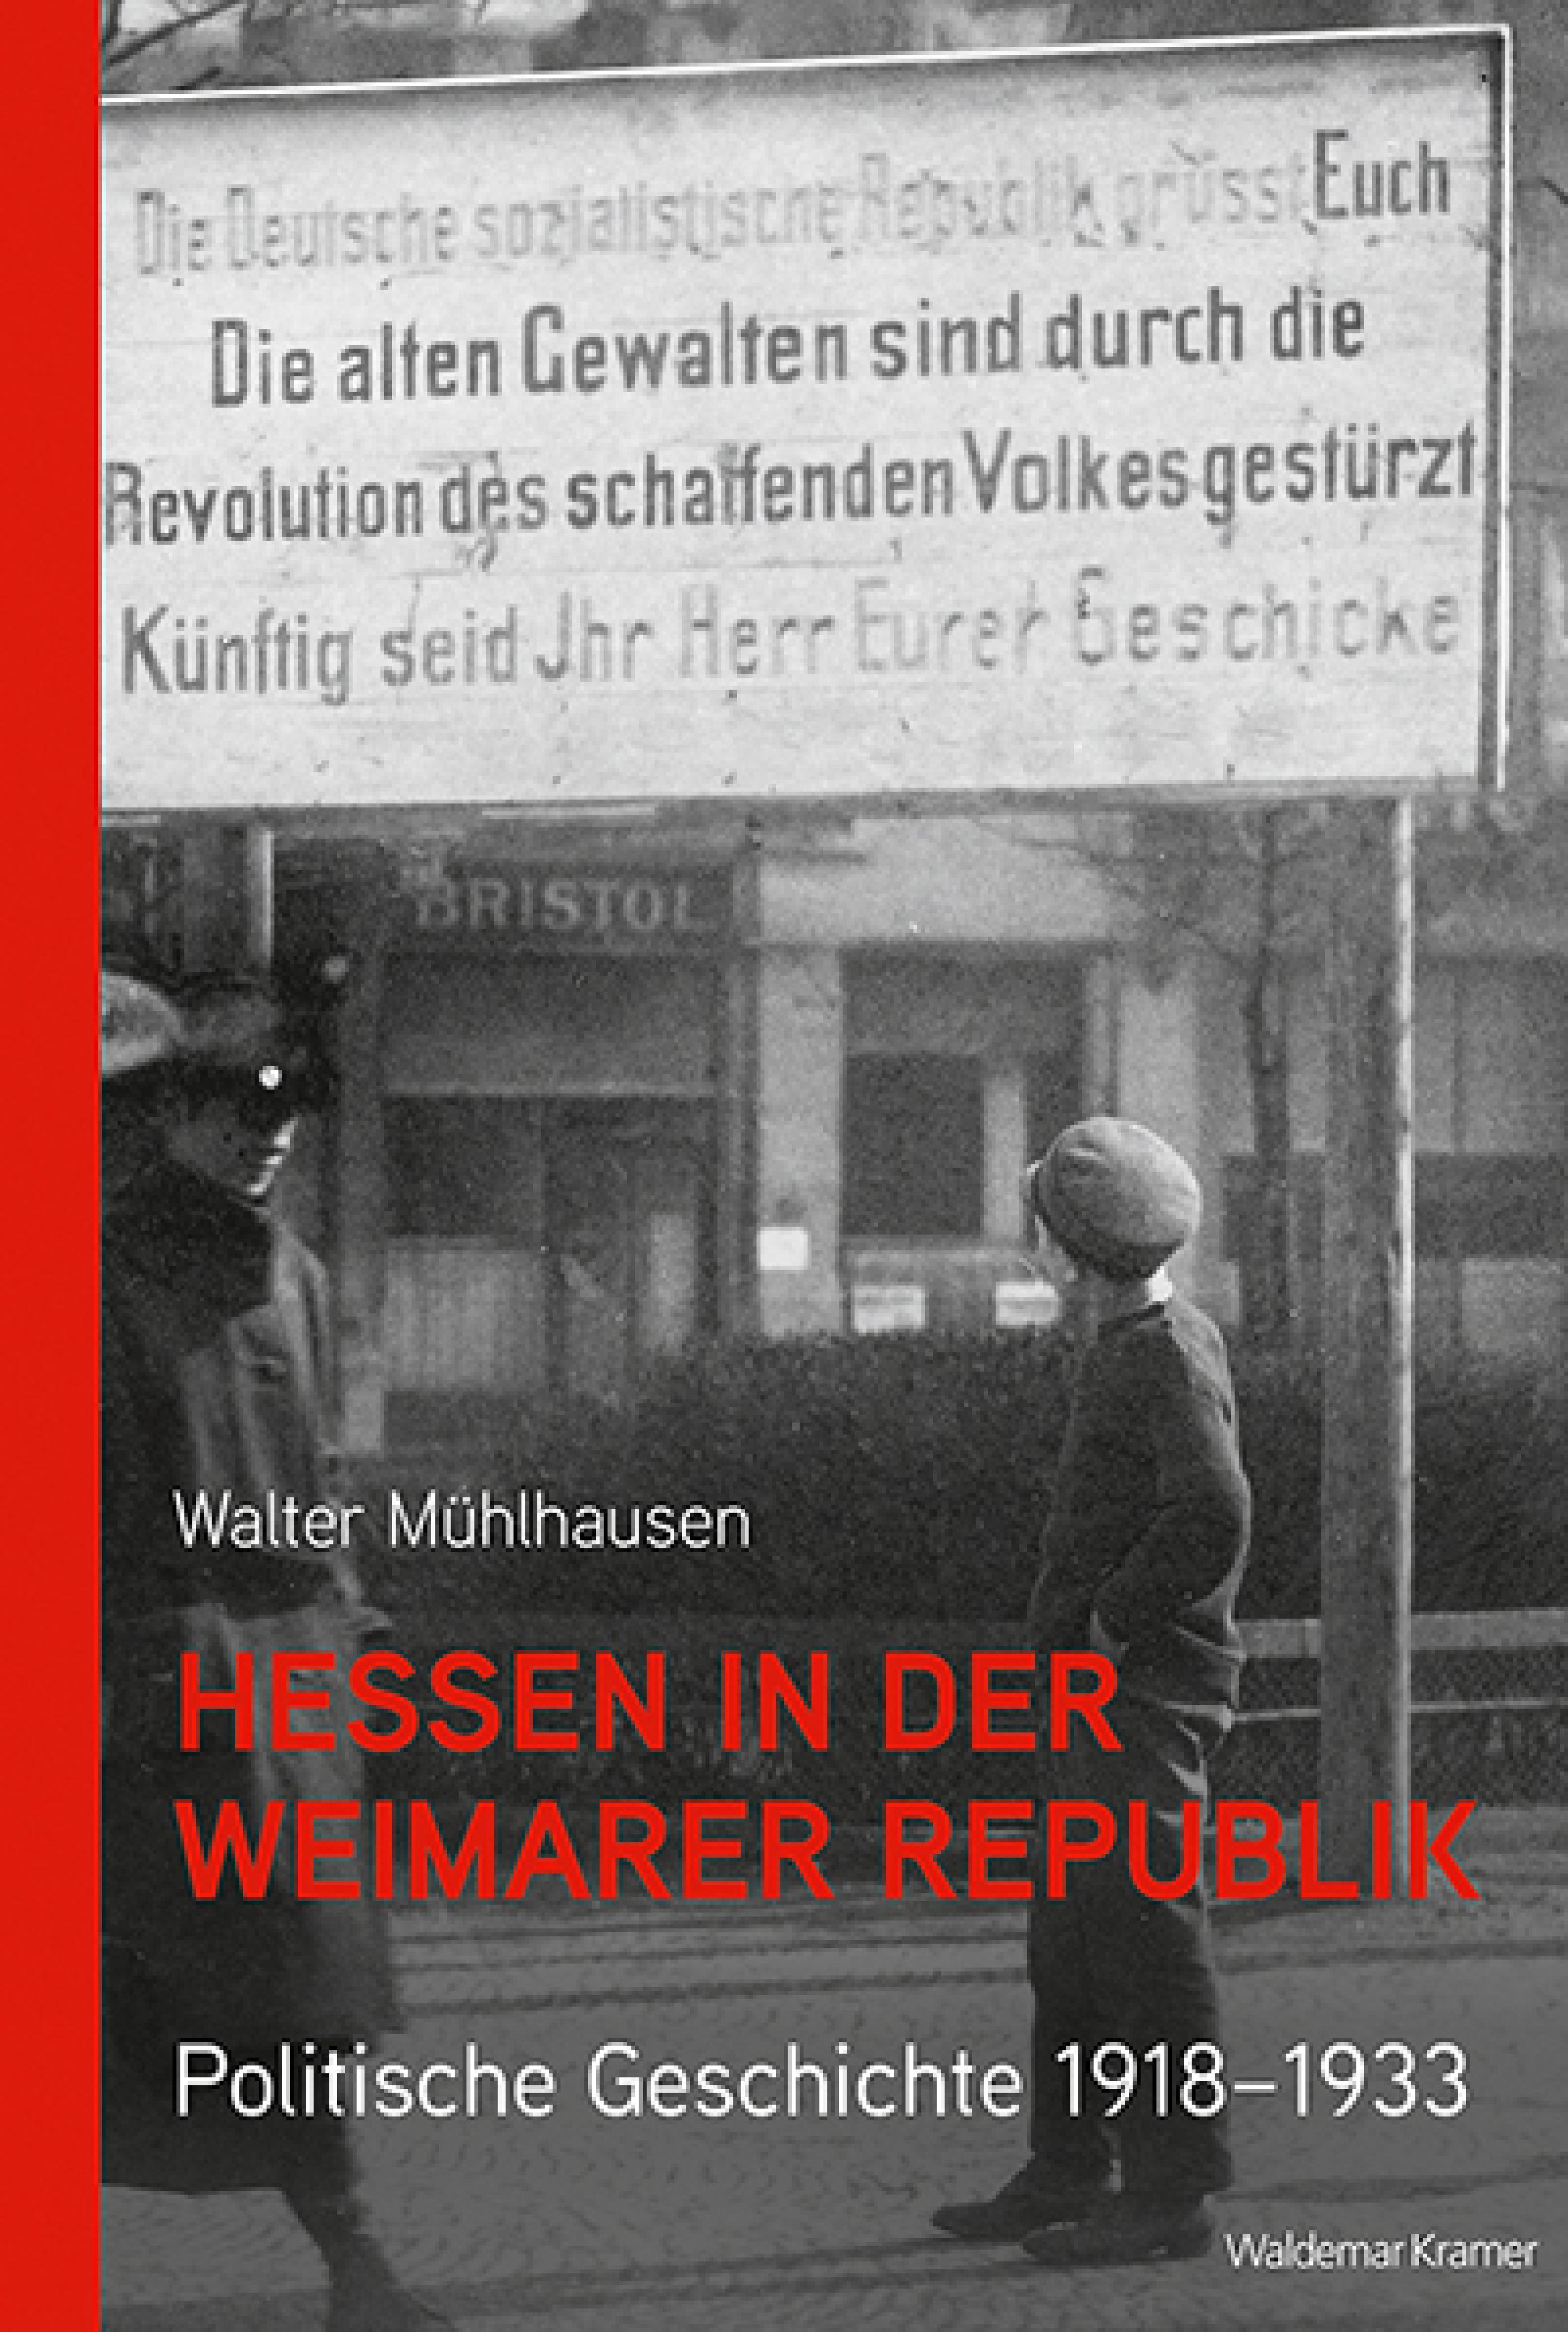 Hessen in der Weimarer Republik